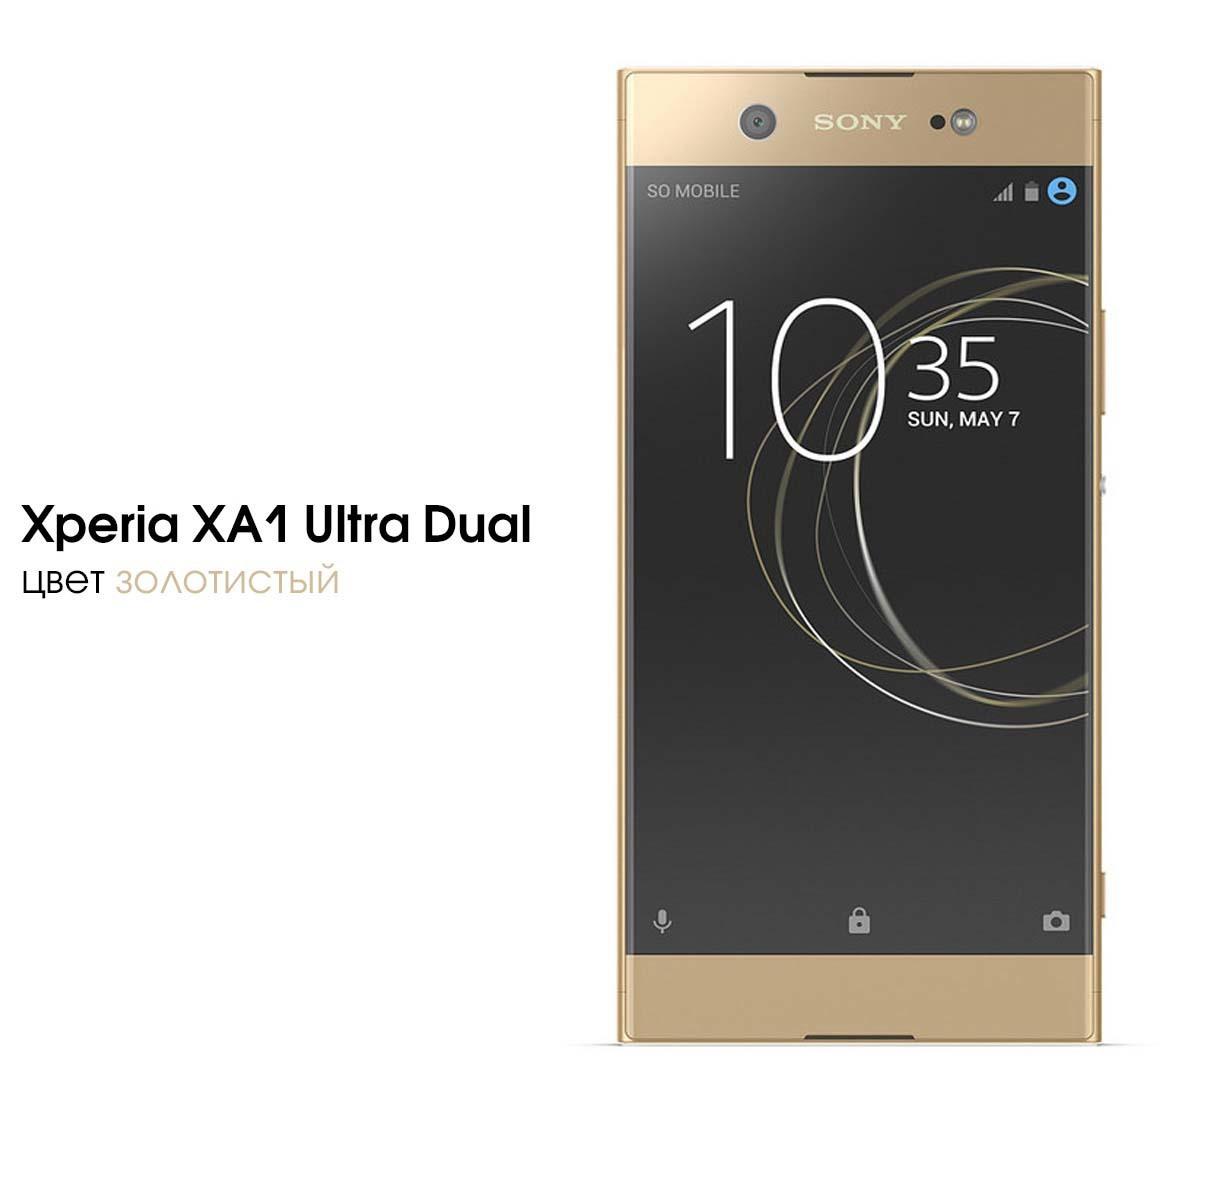 Смартфон Sony Xperia XA1 Ultra Dual, цвет Золотистый